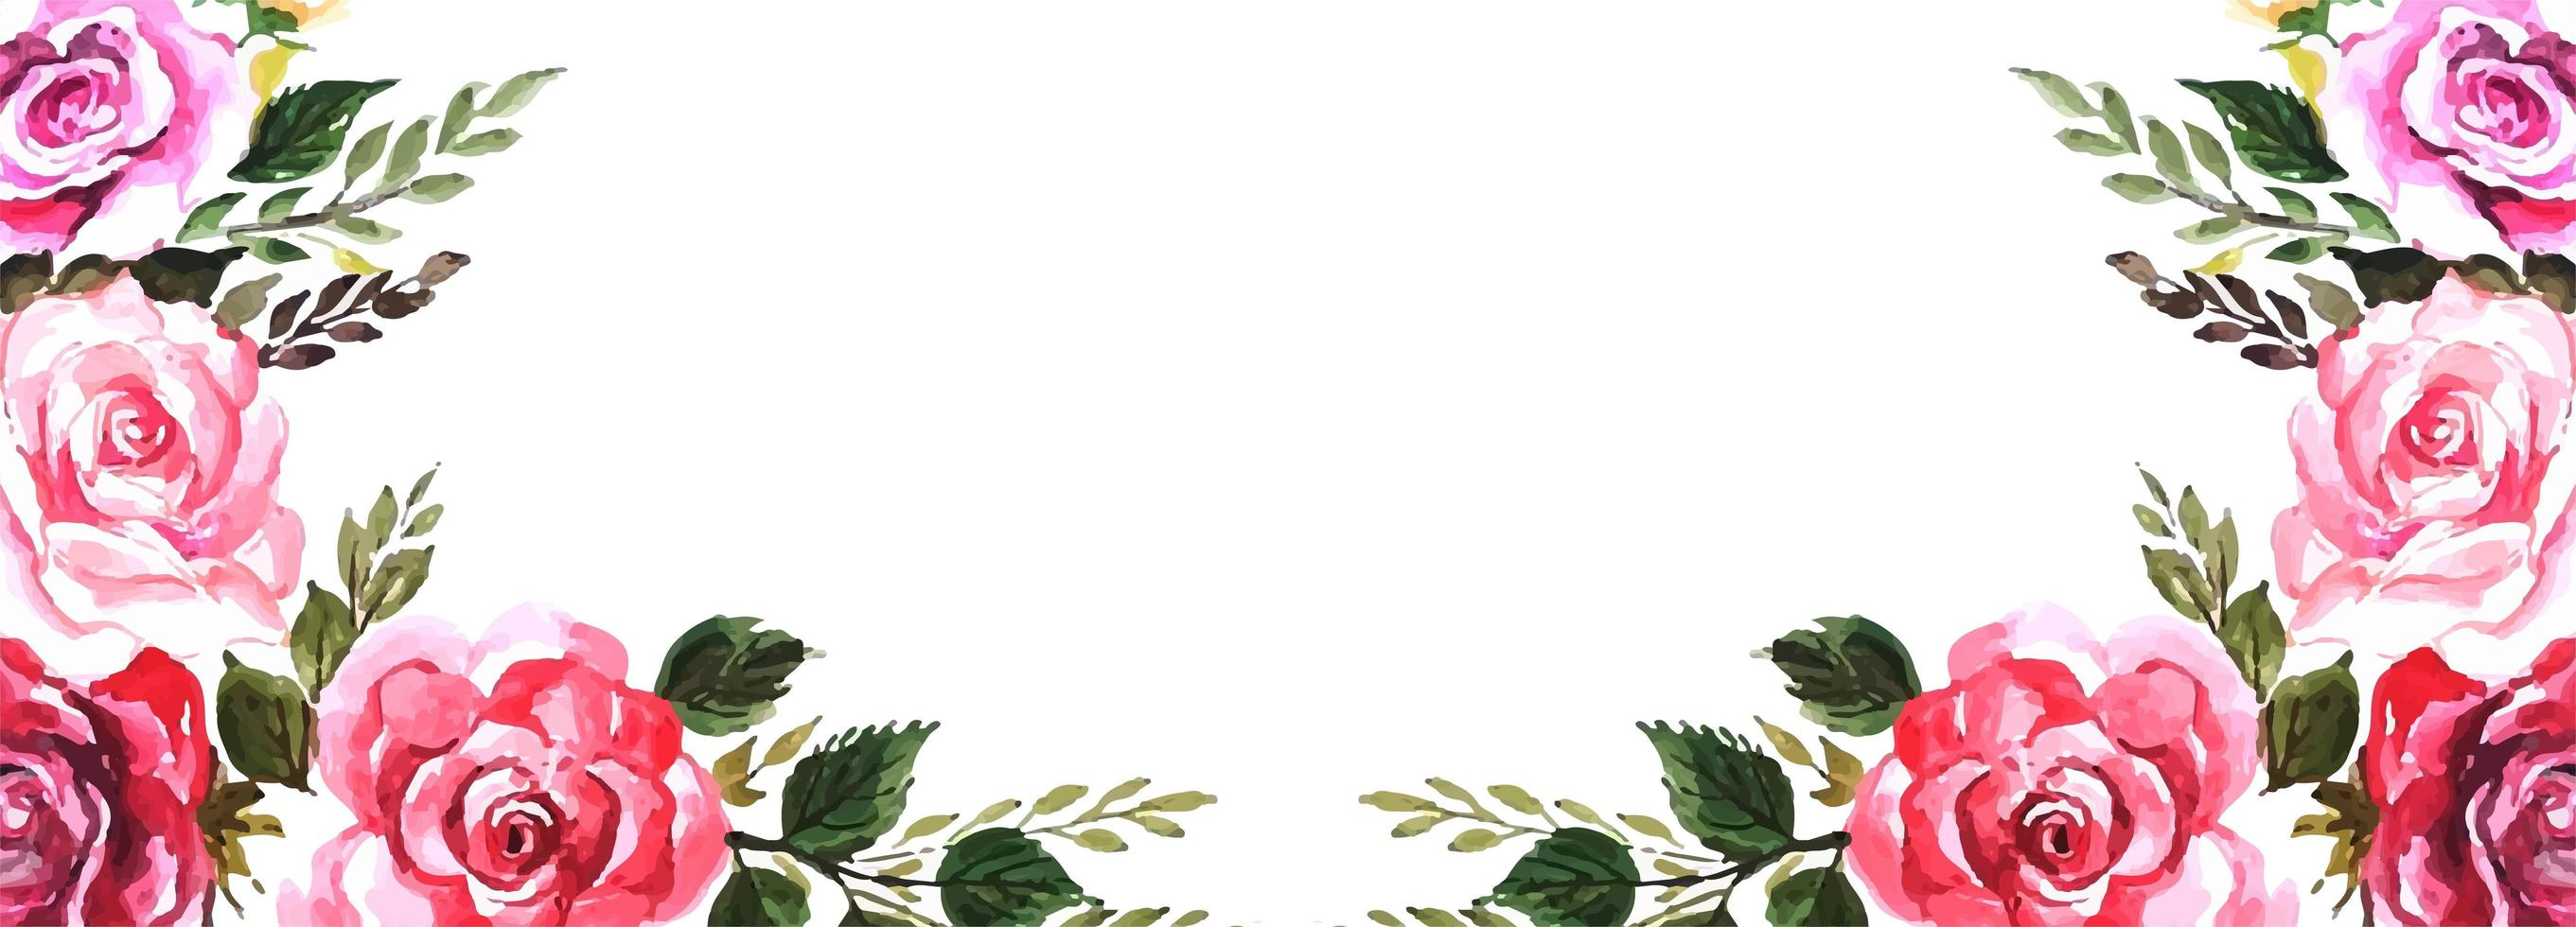 Elegant blommabakgrund vektor